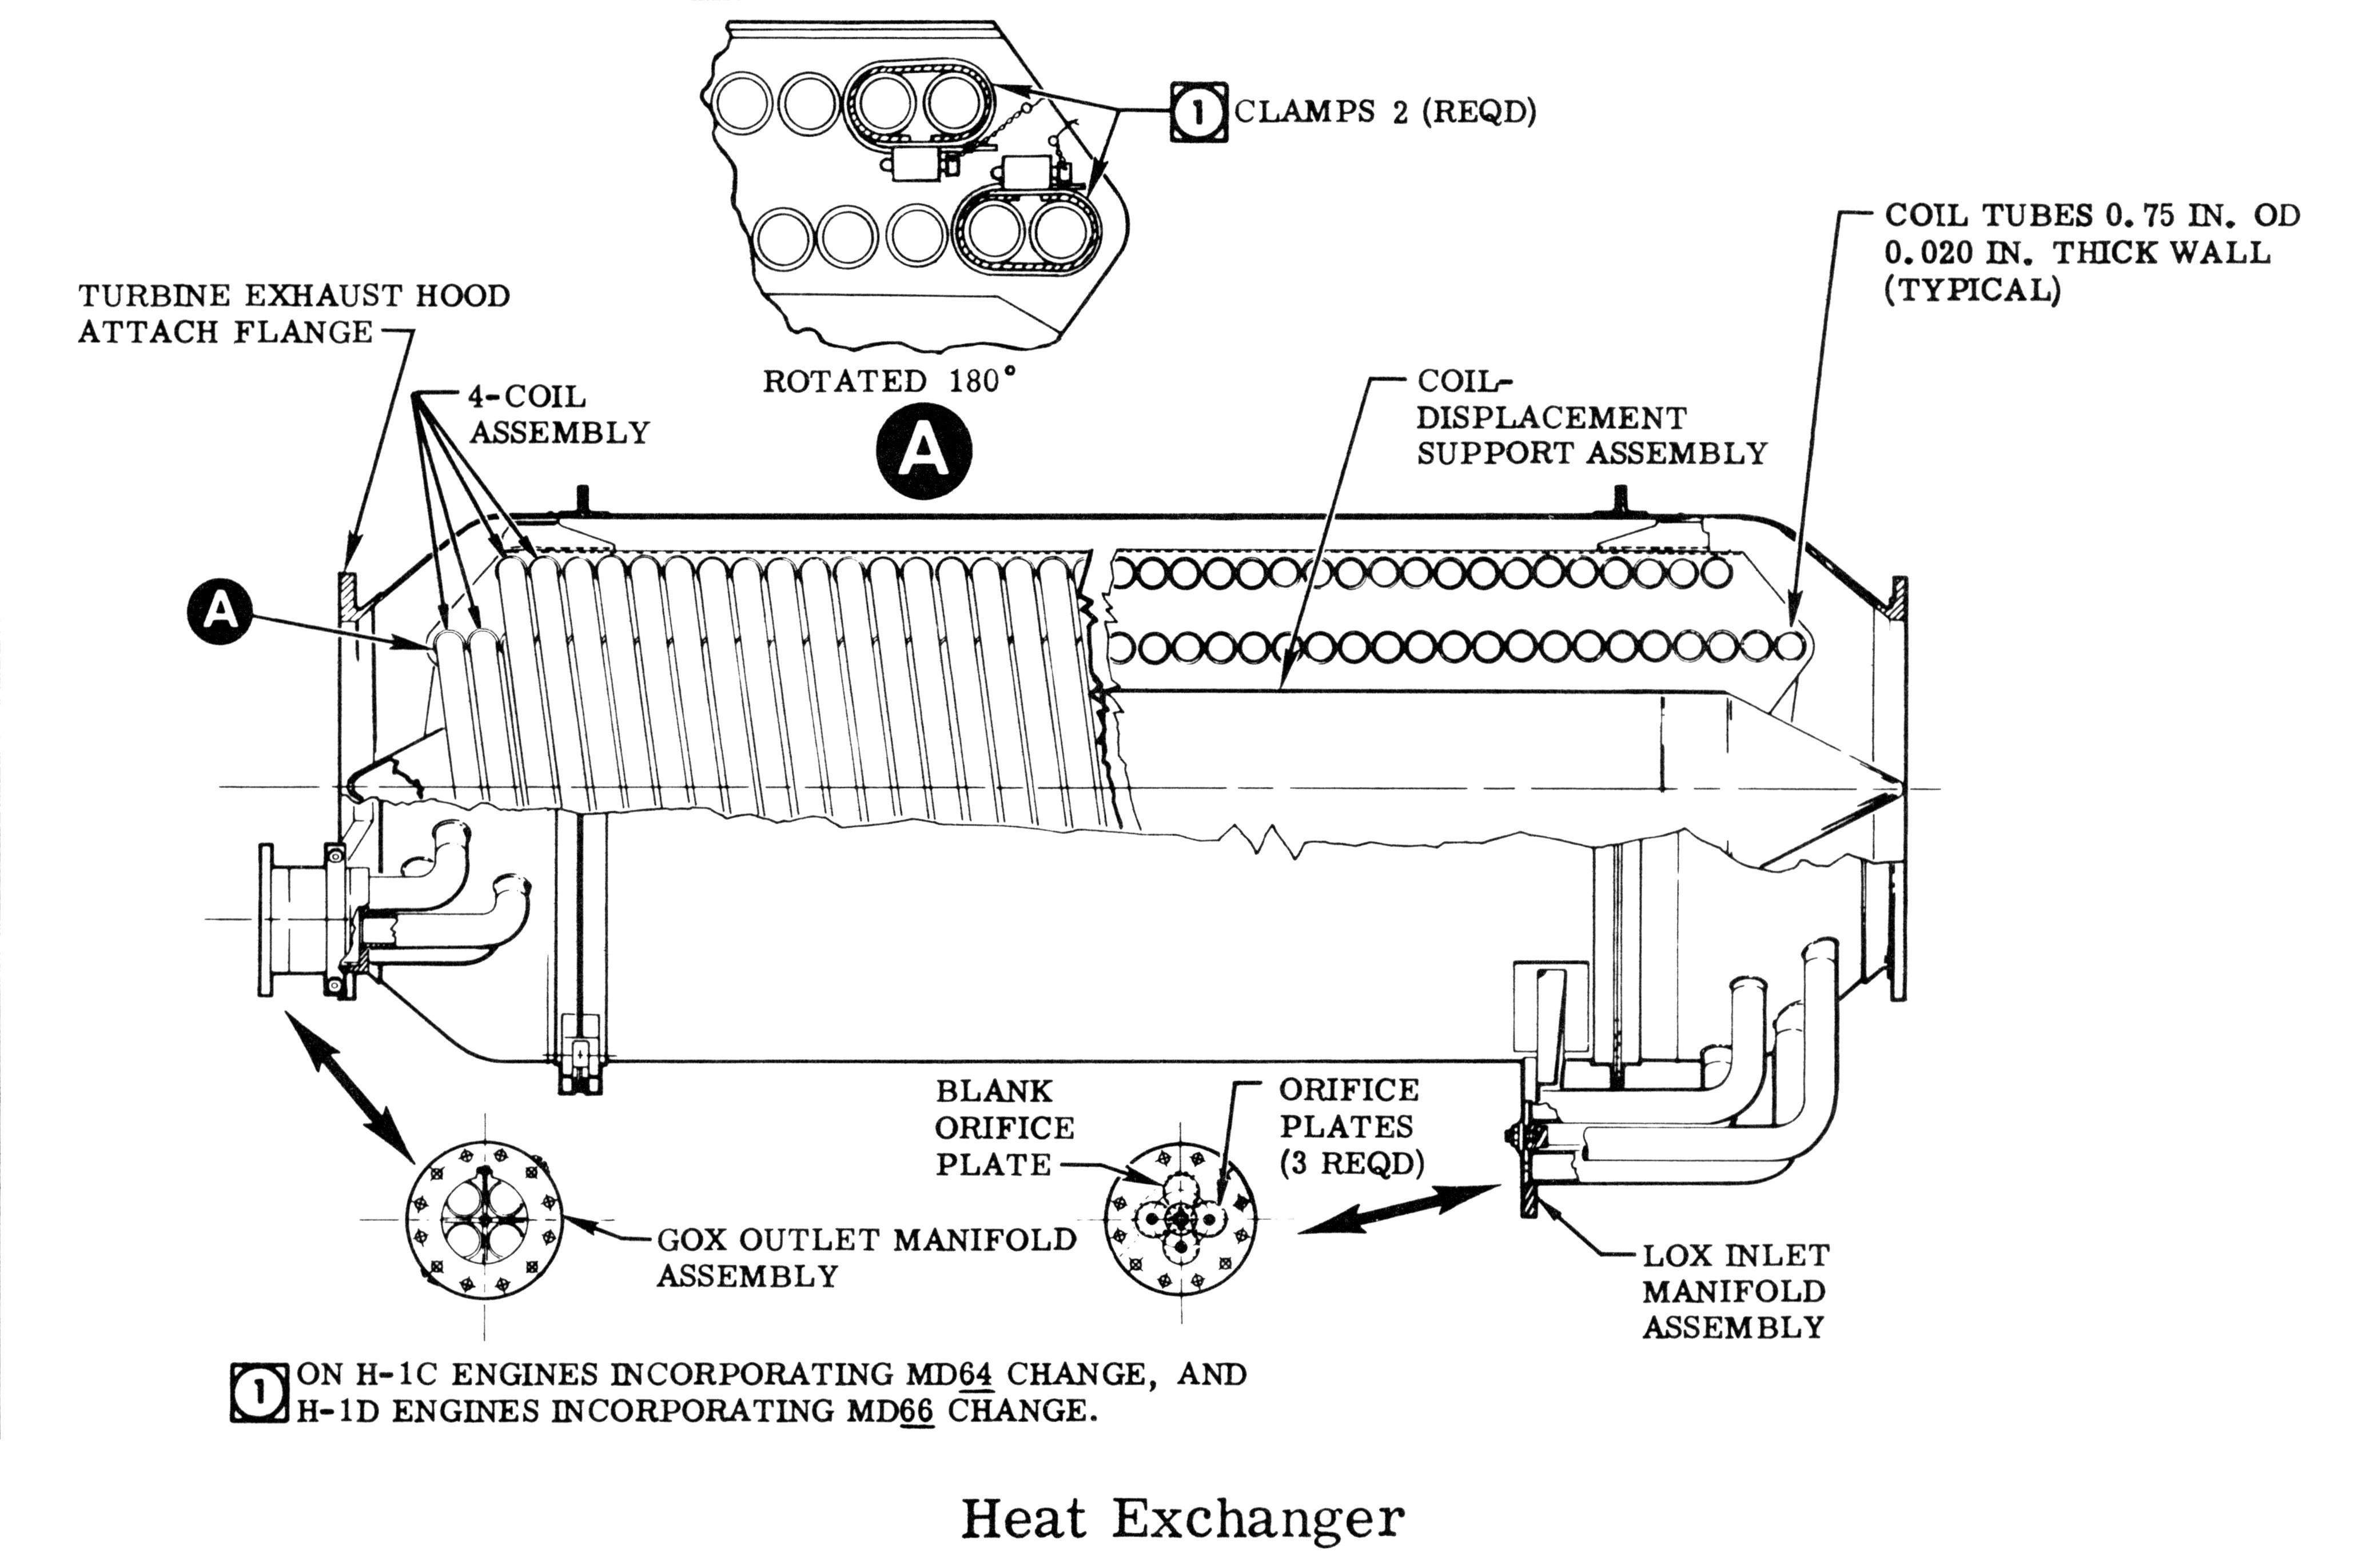 Diagram Of Car Heating System H 1 Heat Exchanger Of Diagram Of Car Heating System